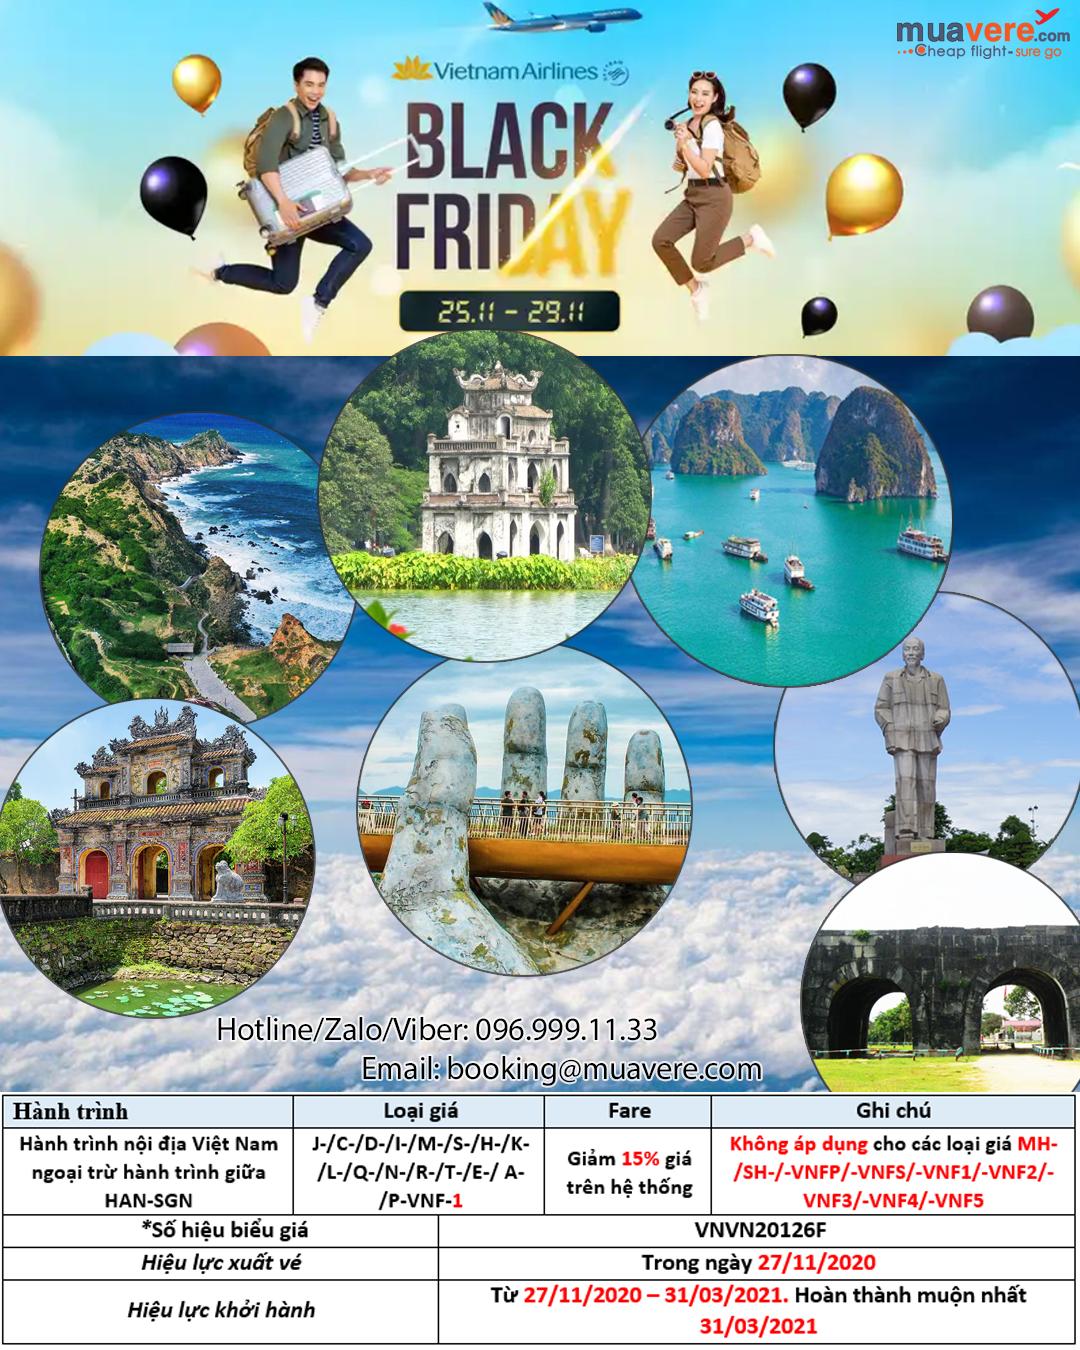 Vietnam Airlines khuyến mại Black Friday